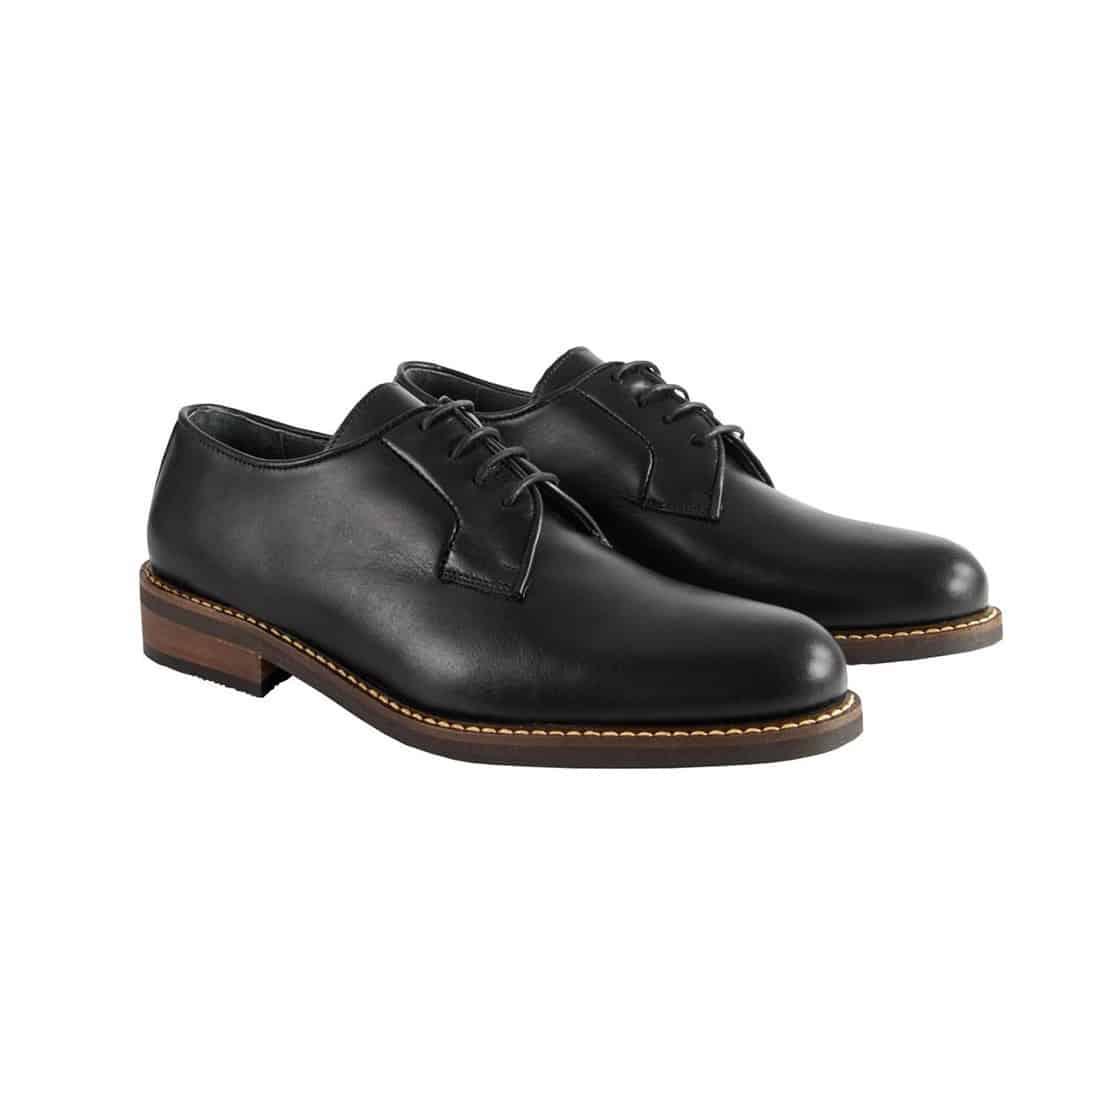 002-zapato-composition-e1563487449947